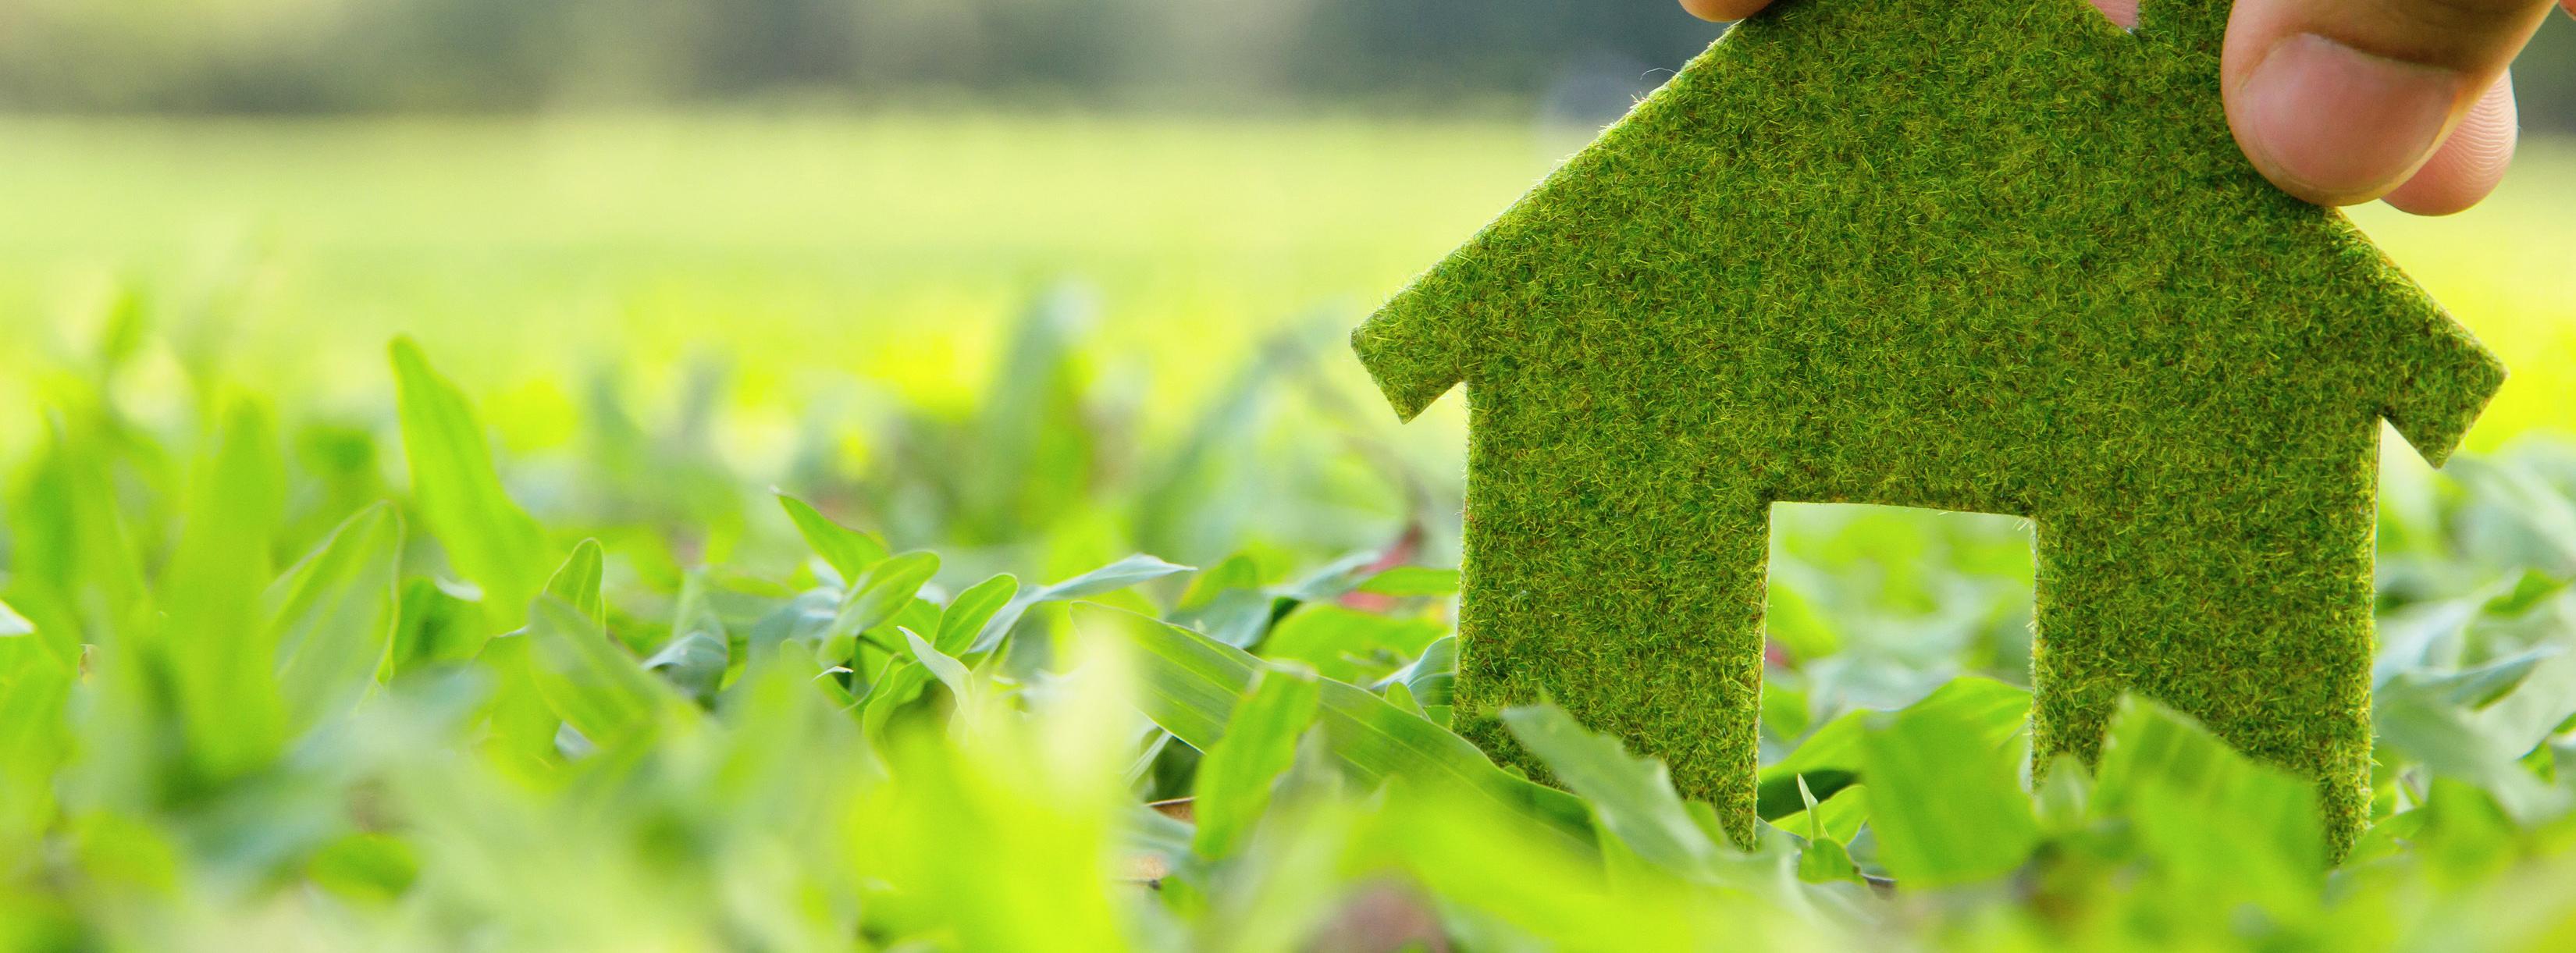 Plan gospodarki niskoemisyjnej dla Gminy Besko na lata 2014-2020